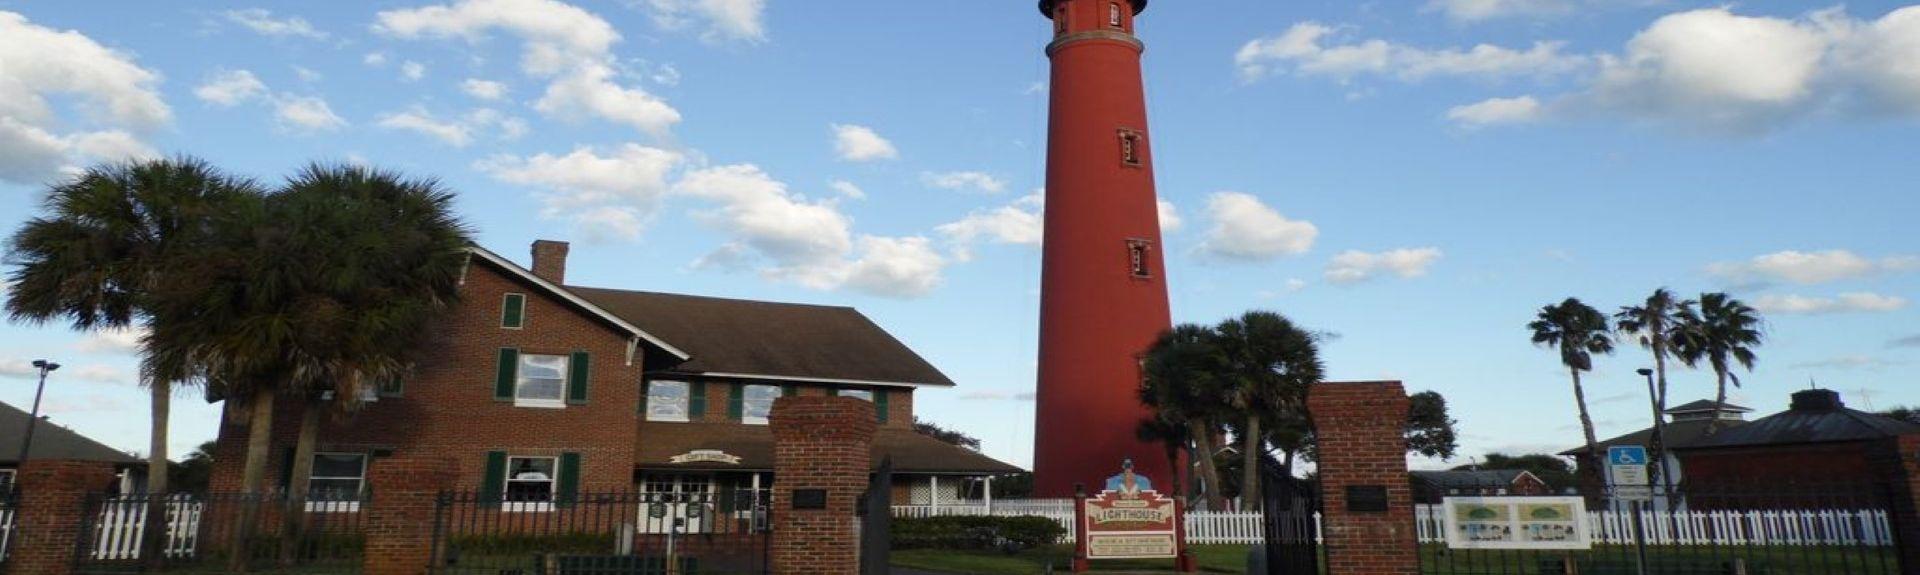 Callalisa Park, New Smyrna Beach, Florida, United States of America